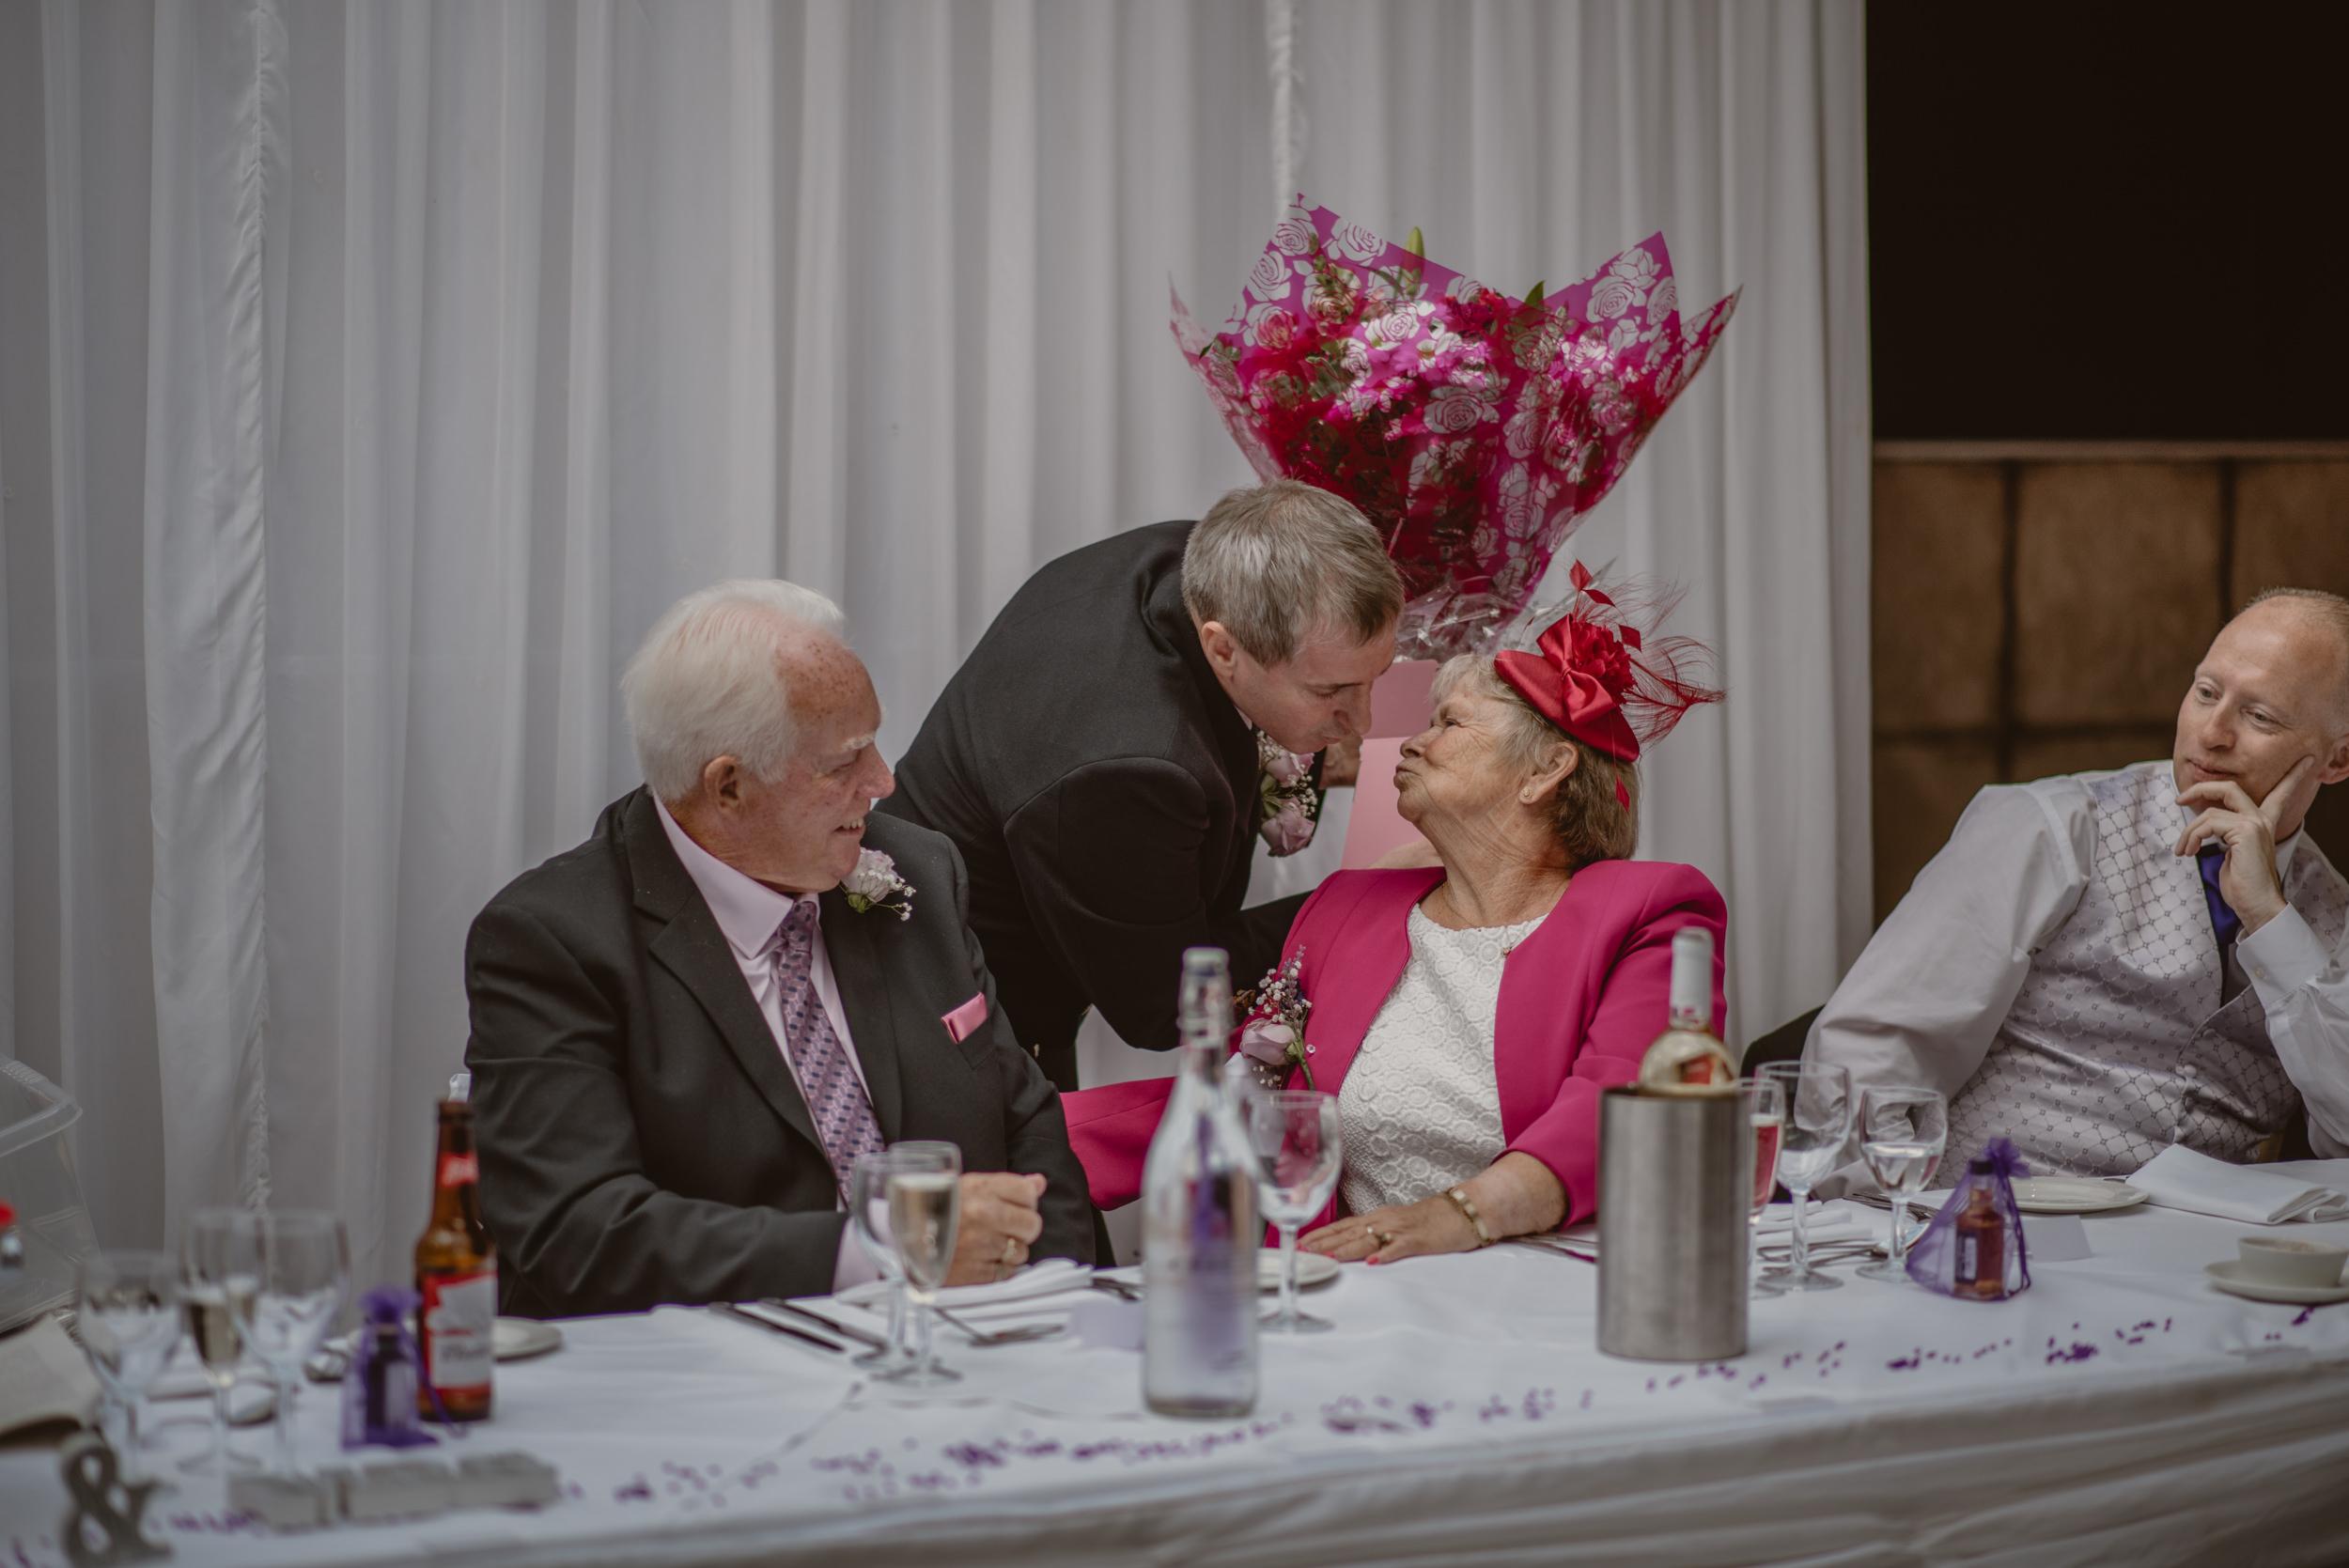 Chantelle-and-Stephen-Old-Thorns-Hotel-Wedding-Liphook-Manu-Mendoza-Wedding-Photography-391.jpg